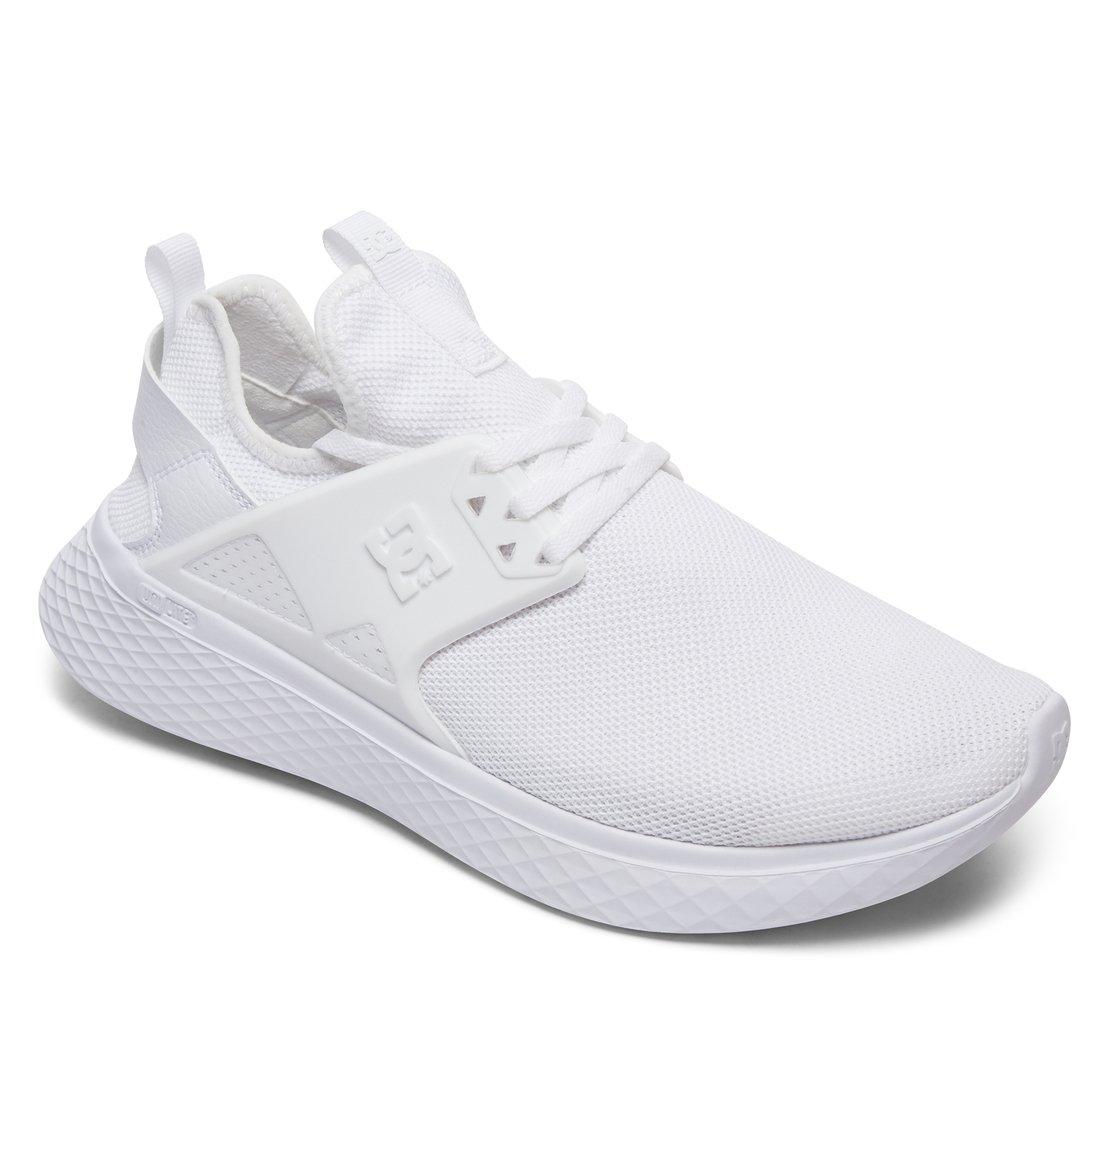 Nike 807471-004, Chaussures de Sport Femme, Gris (4), 42.5 EU